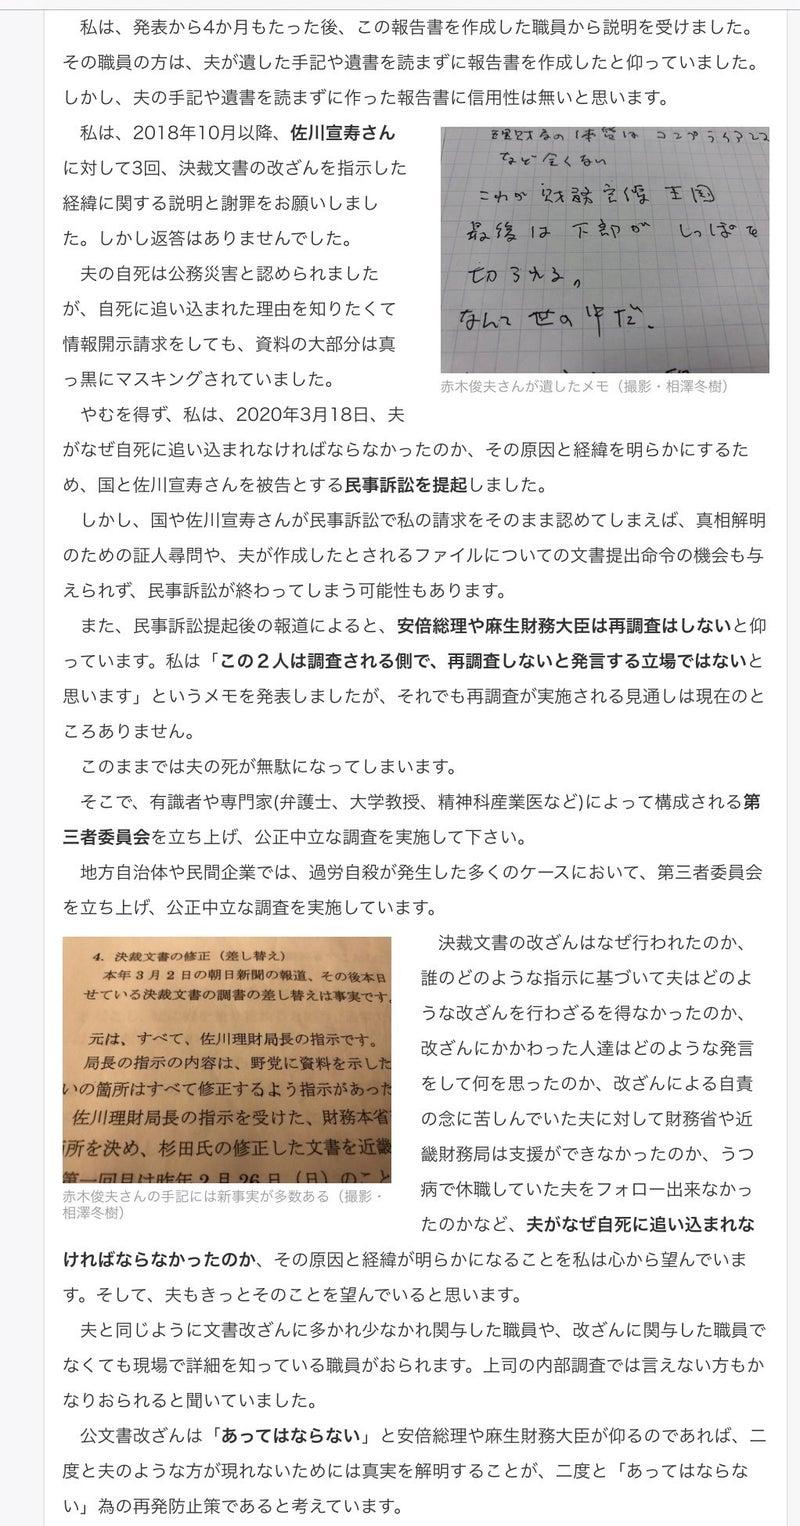 俊夫 遺書 赤木 森友 文書改ざん